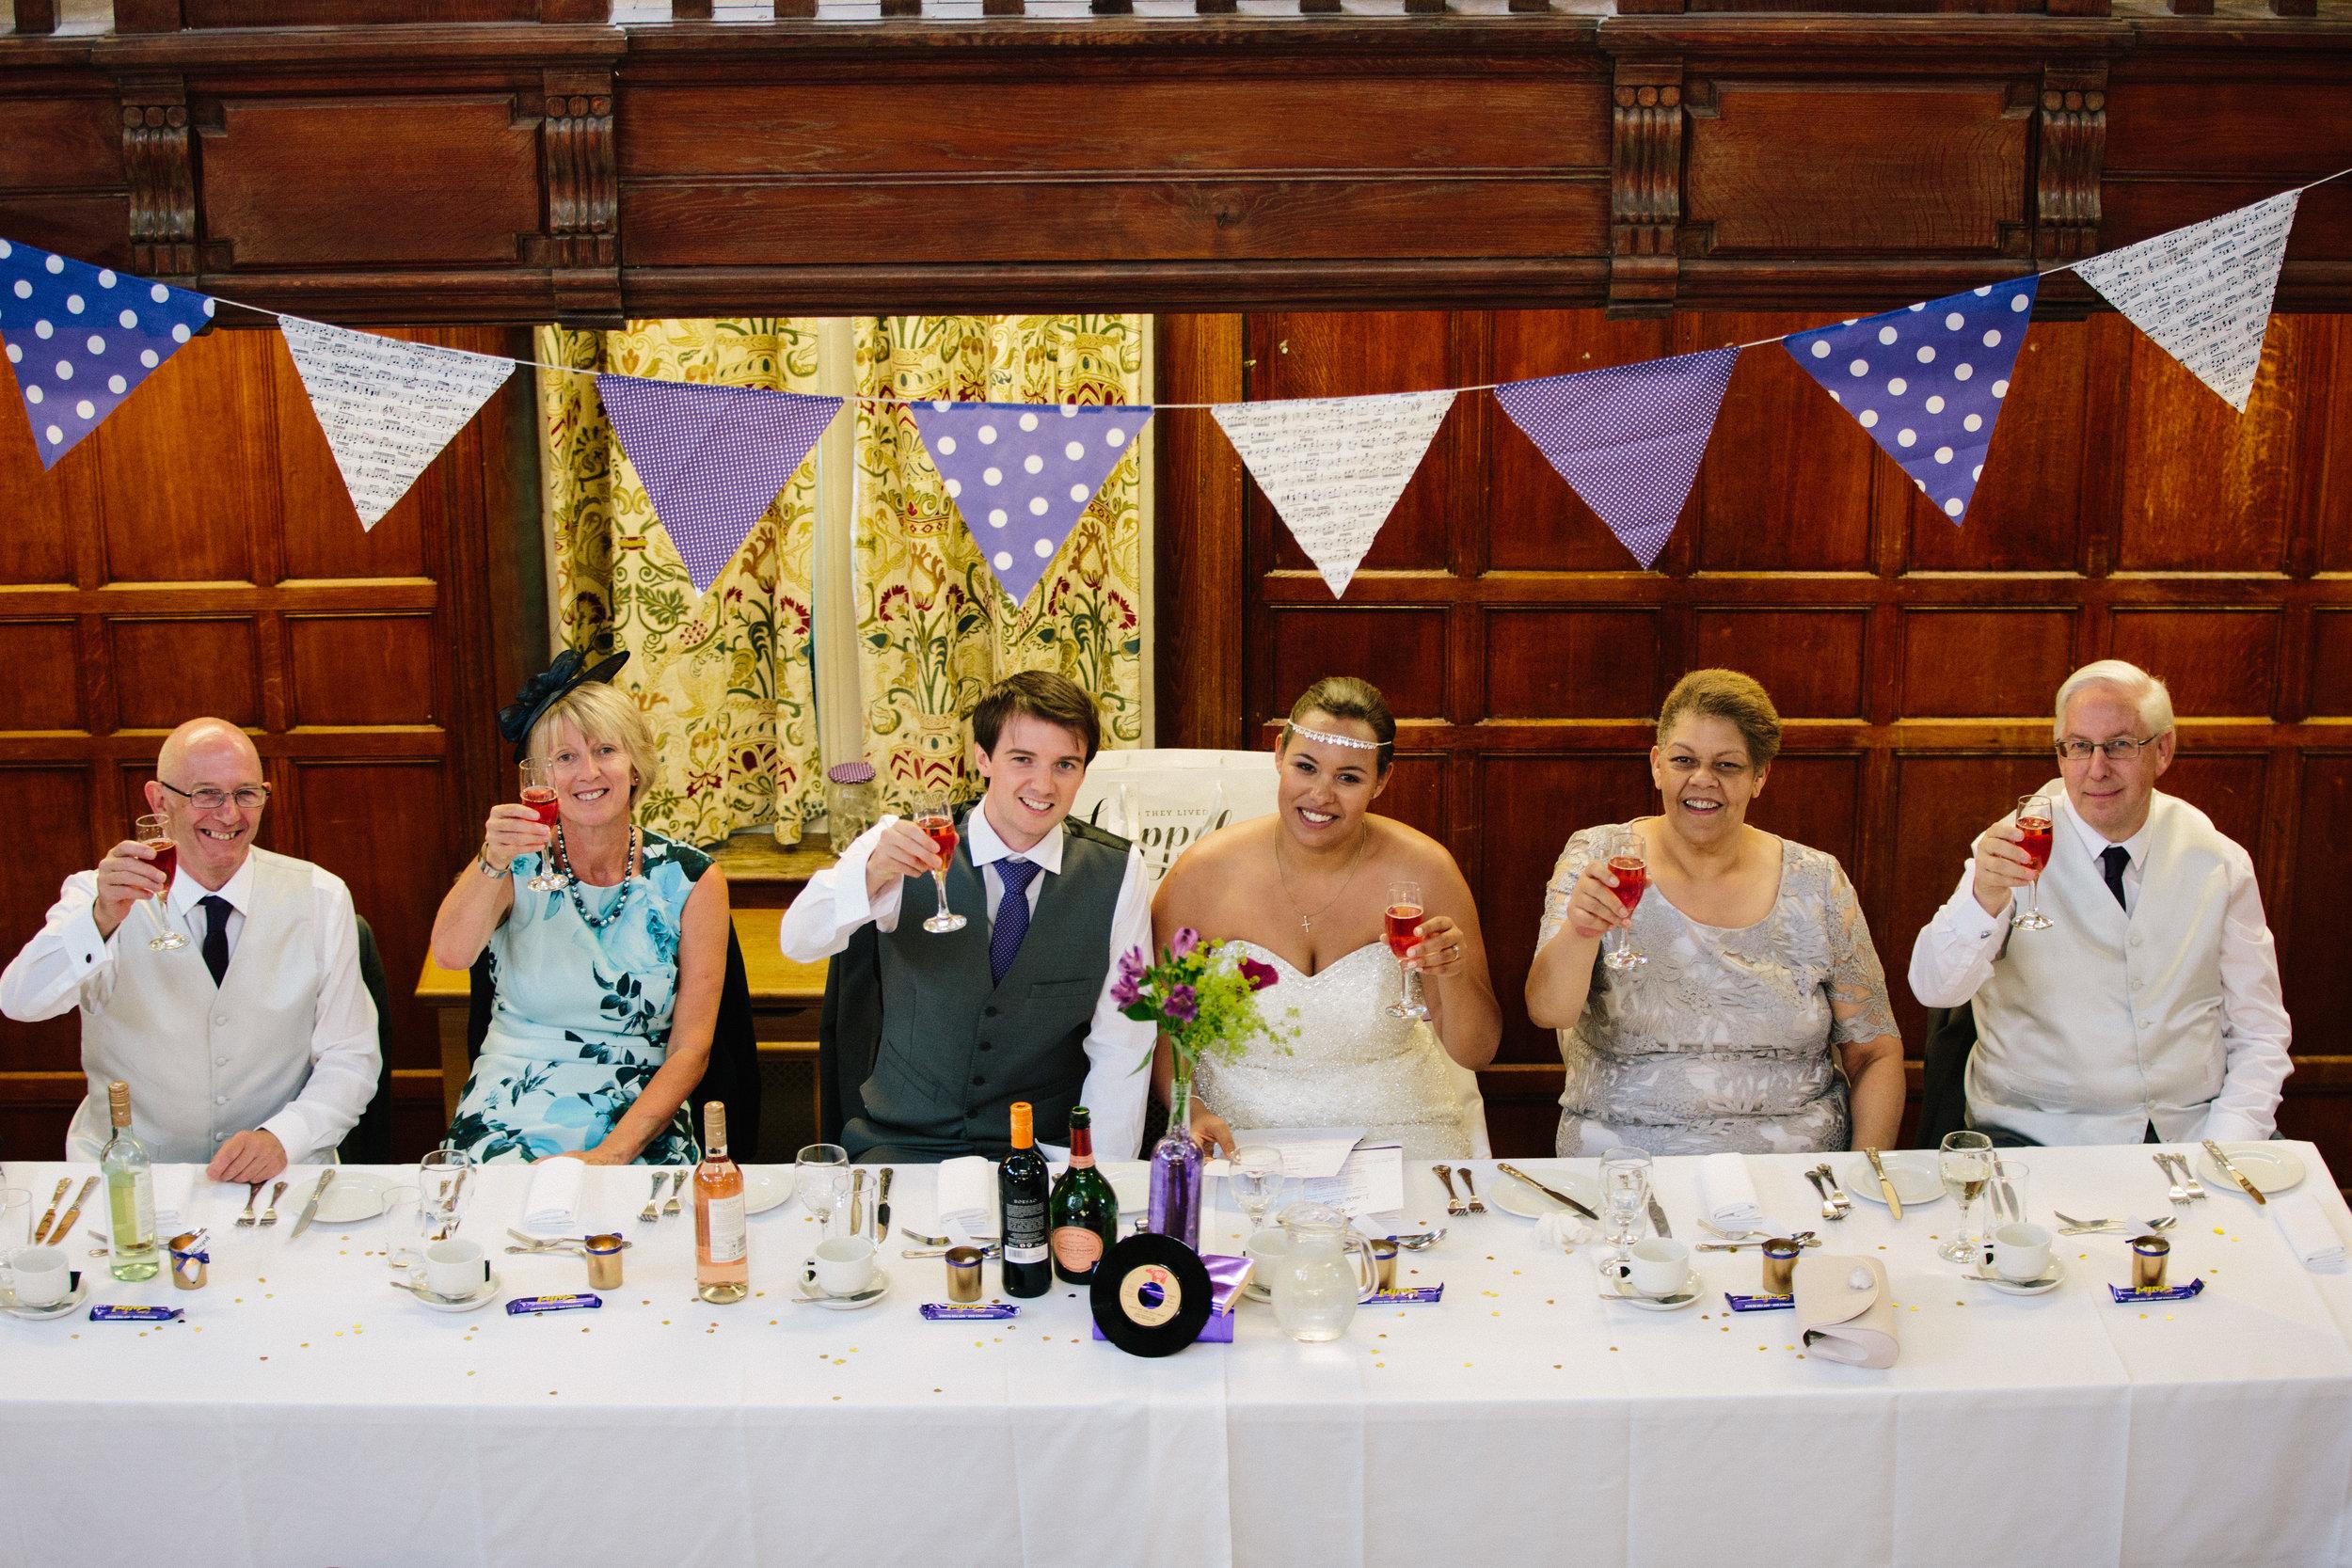 Saint-Alfege-Church-greenwich-wedding-charlton-house-reception-238